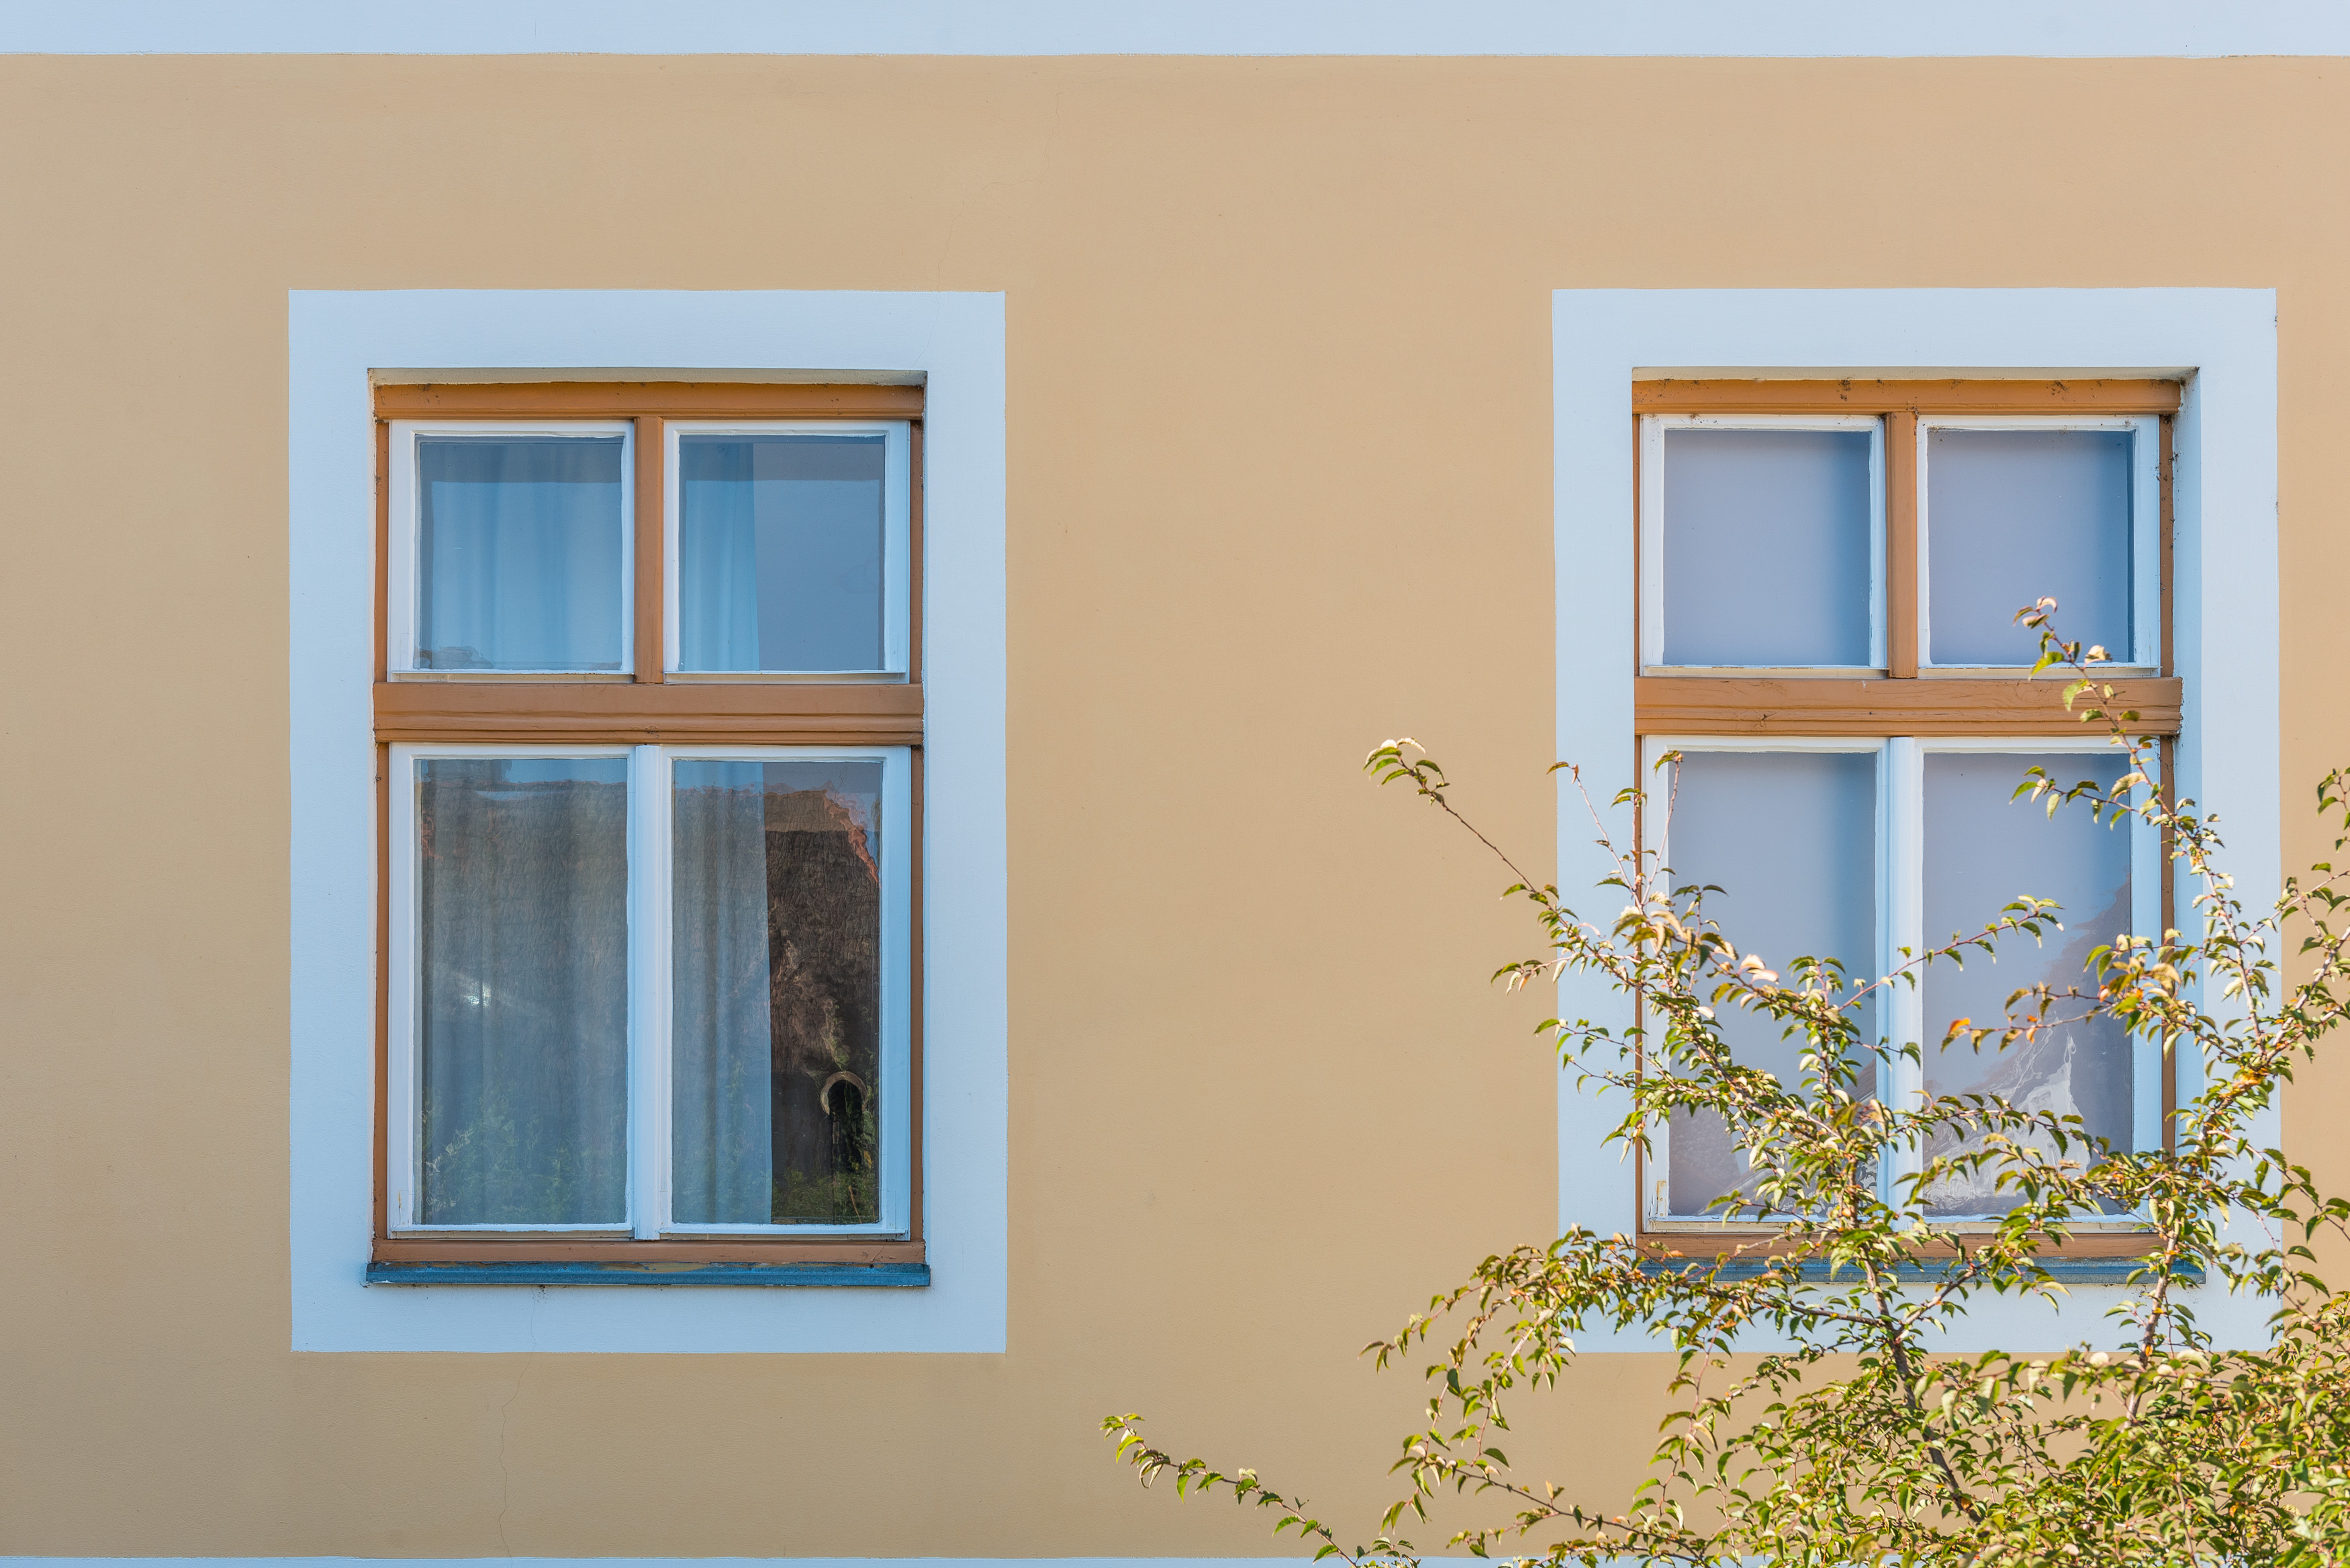 Kastenfenster © Punkt Fünf e.U./Martin Skopal